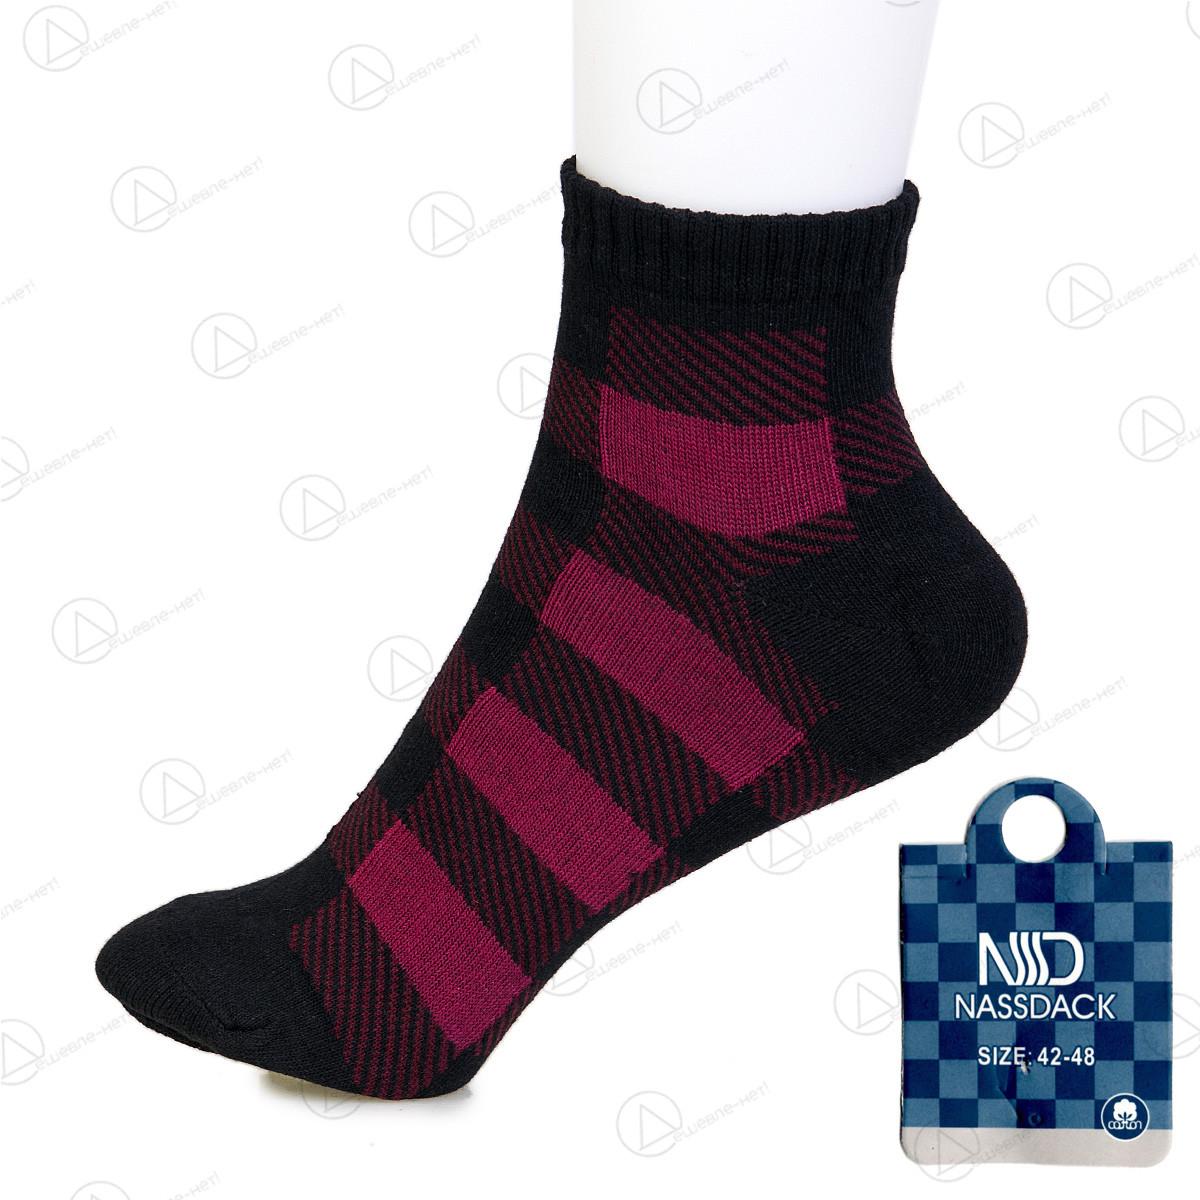 Бордовые носки мужские низкие Nassdack 1004-2drn